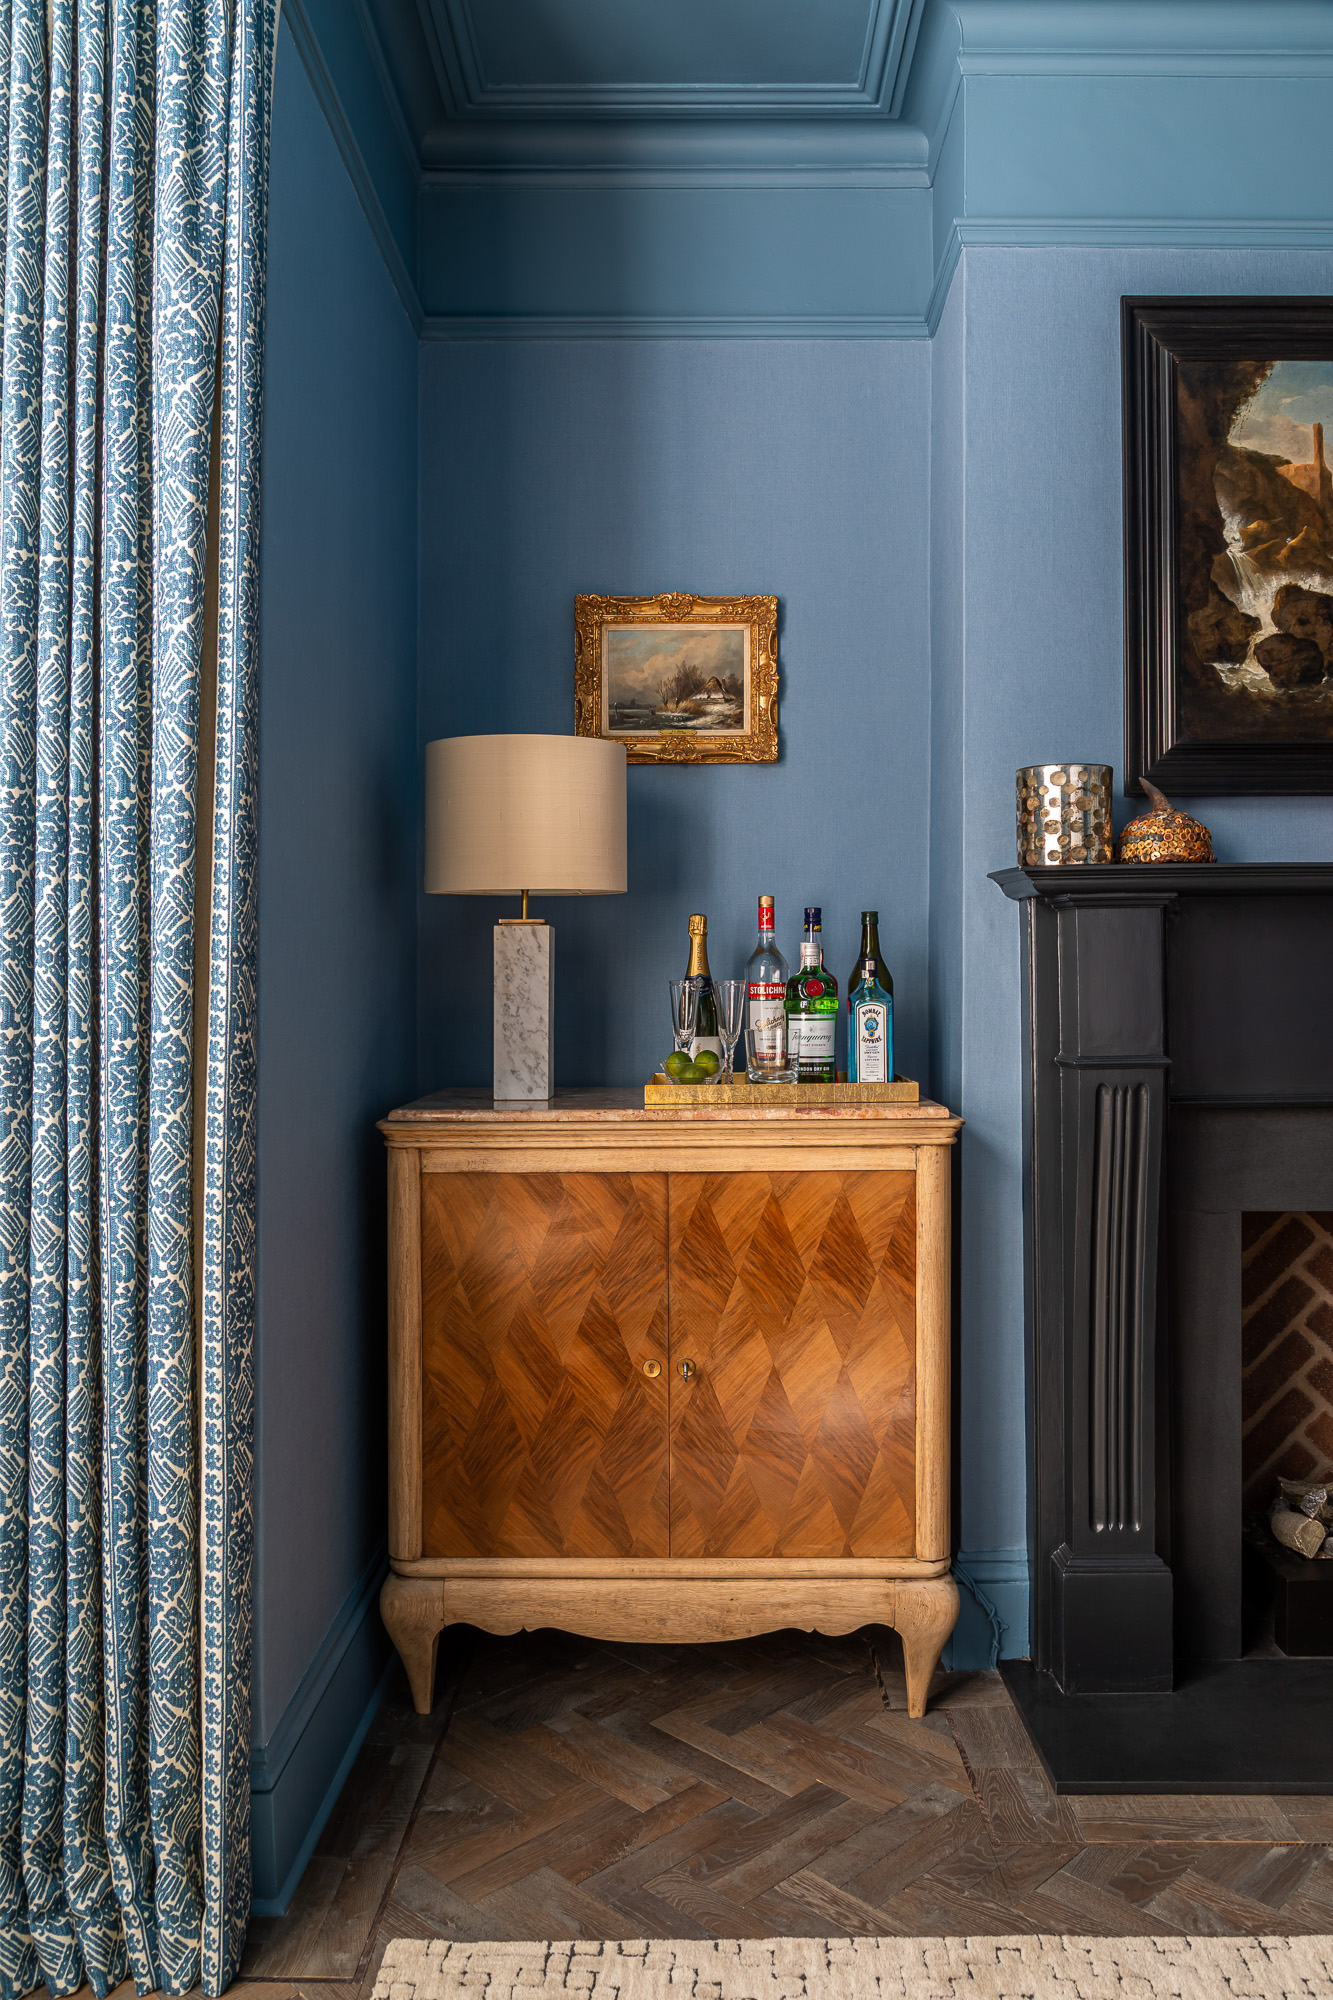 jonathan bond, interior photographer, drinks cabinet, clapham, london